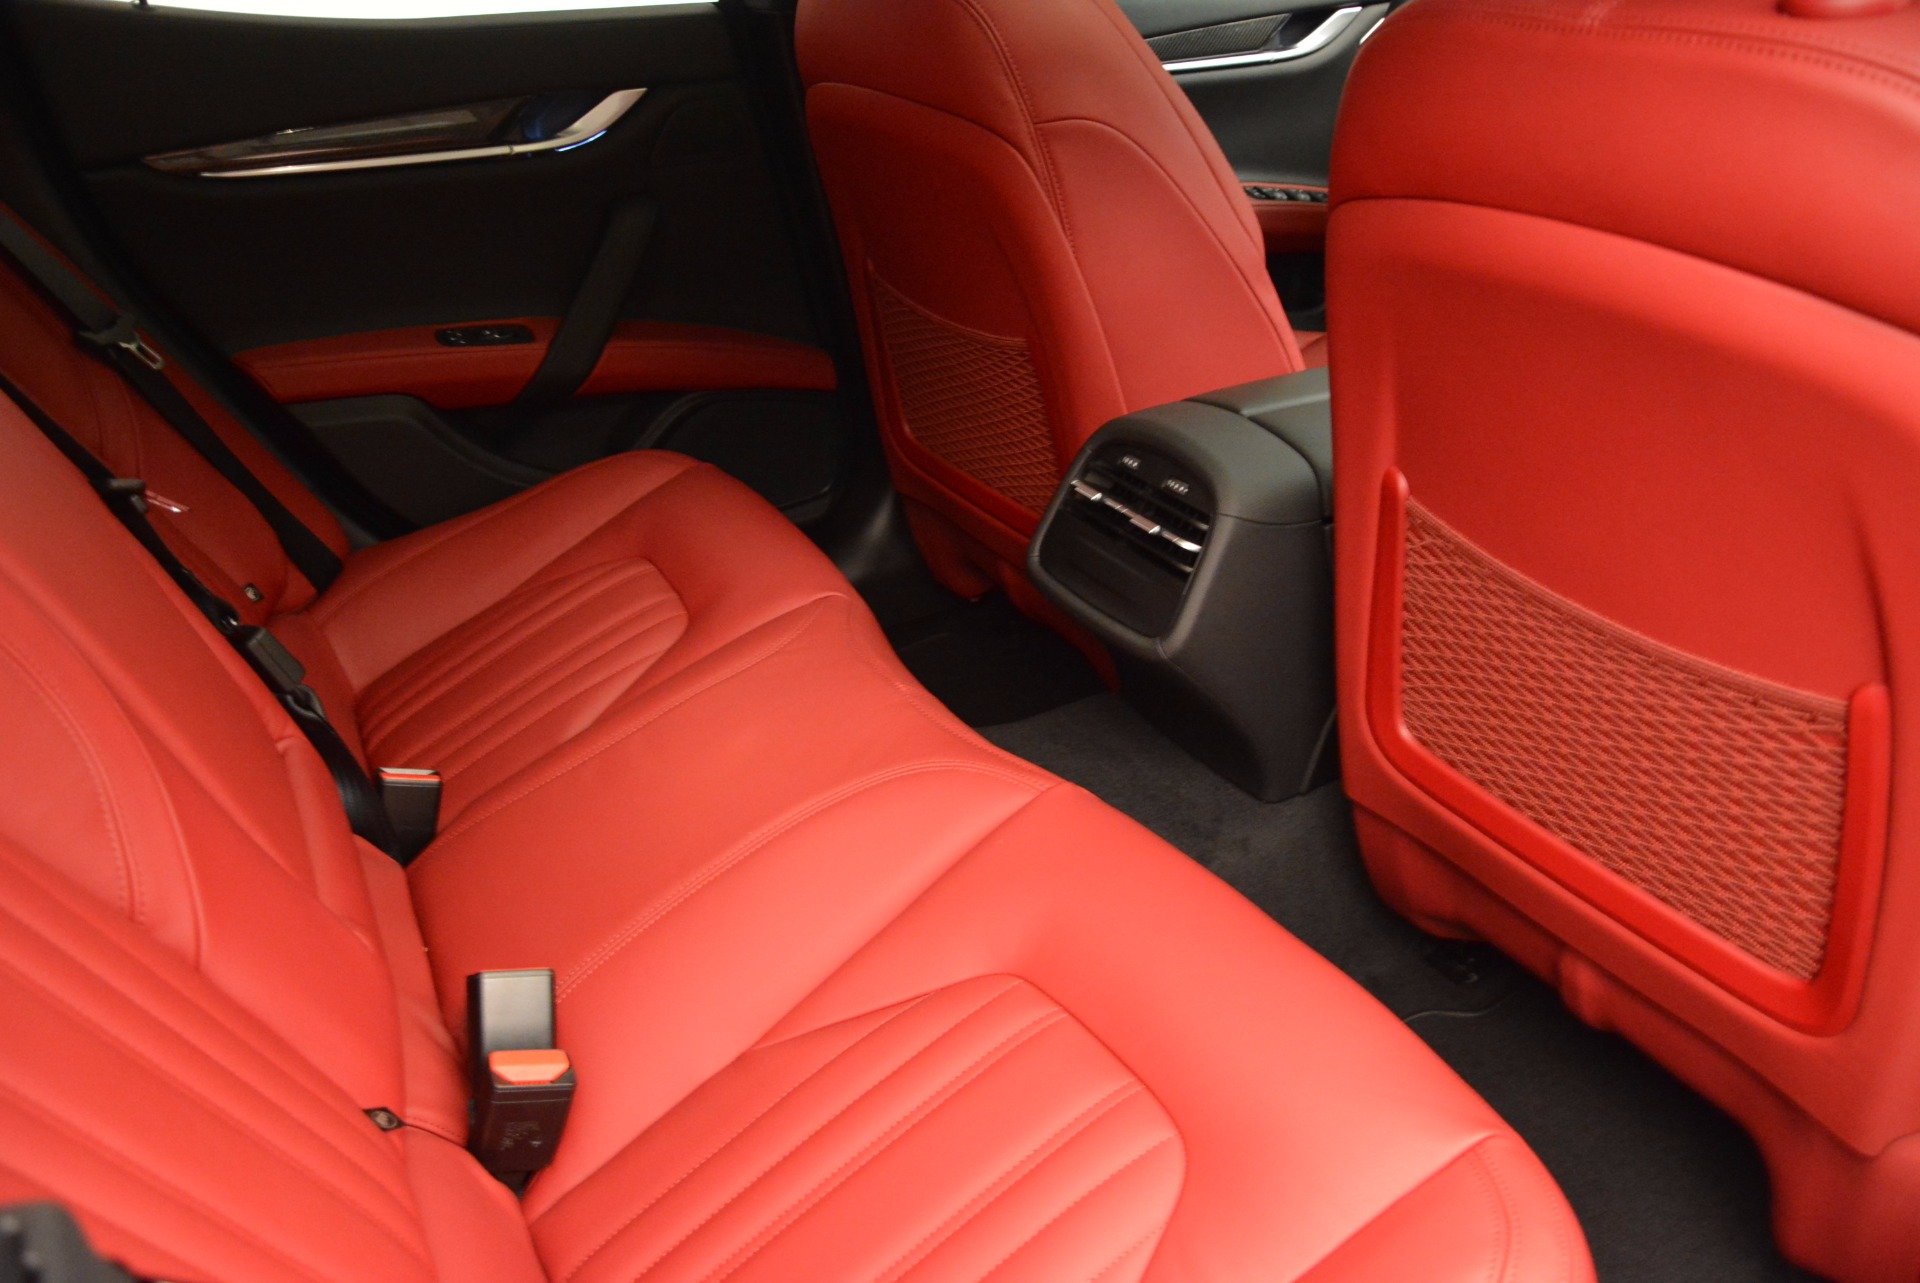 Used 2015 Maserati Ghibli S Q4 For Sale In Westport, CT 1290_p23